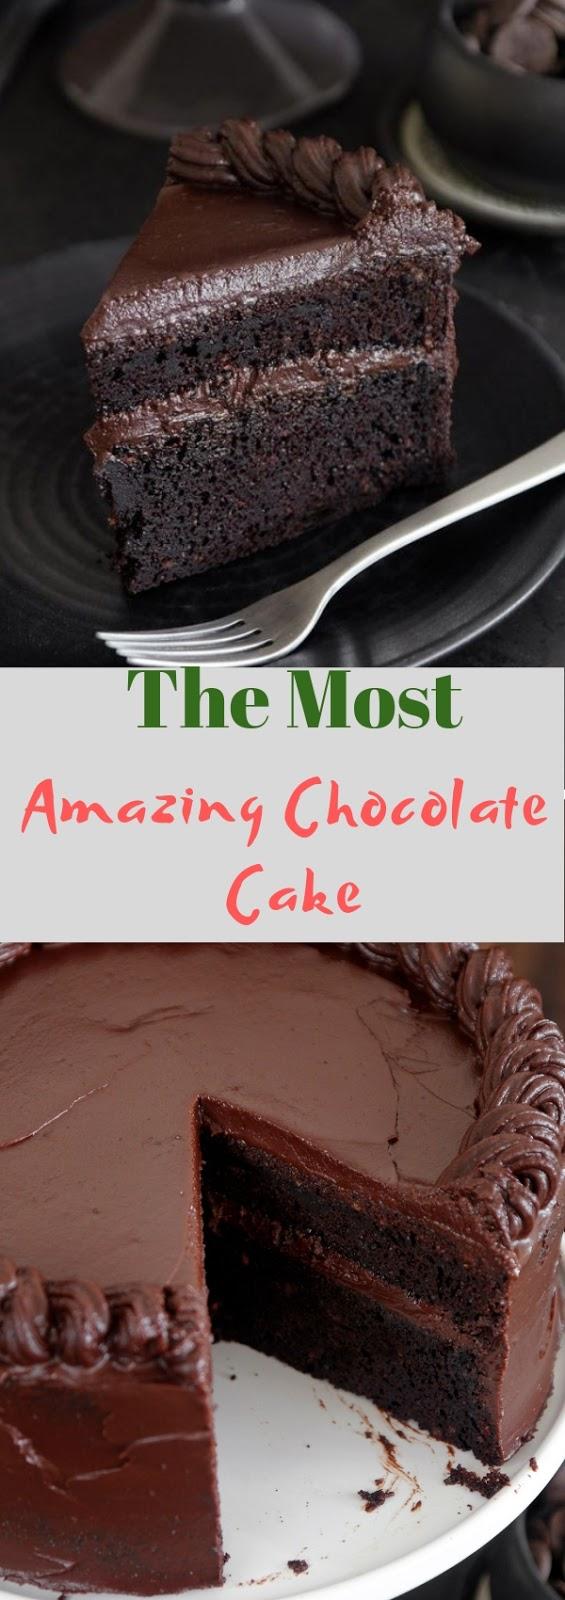 The Most Amazing Chocolate Cake #dessert #cake #chocolate